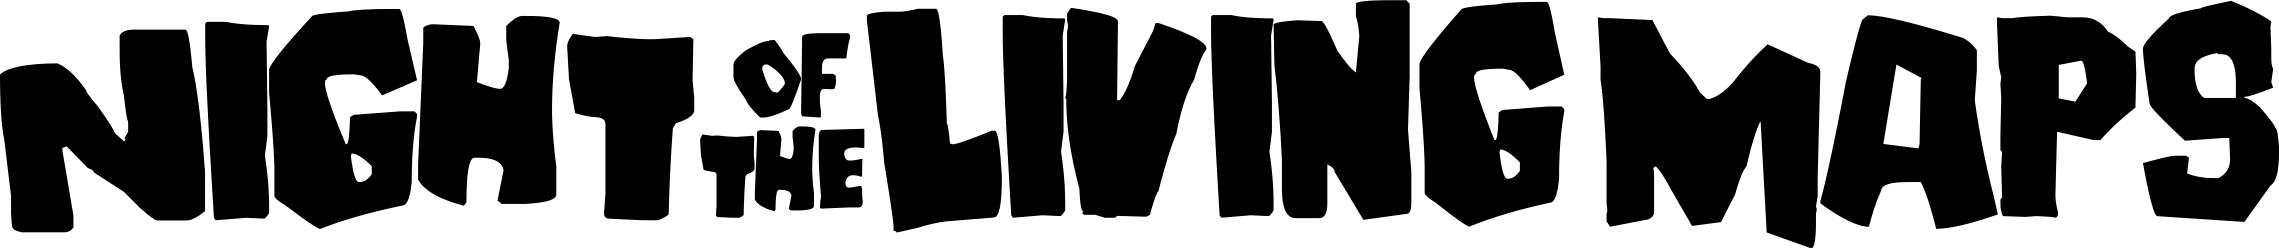 notlm banner